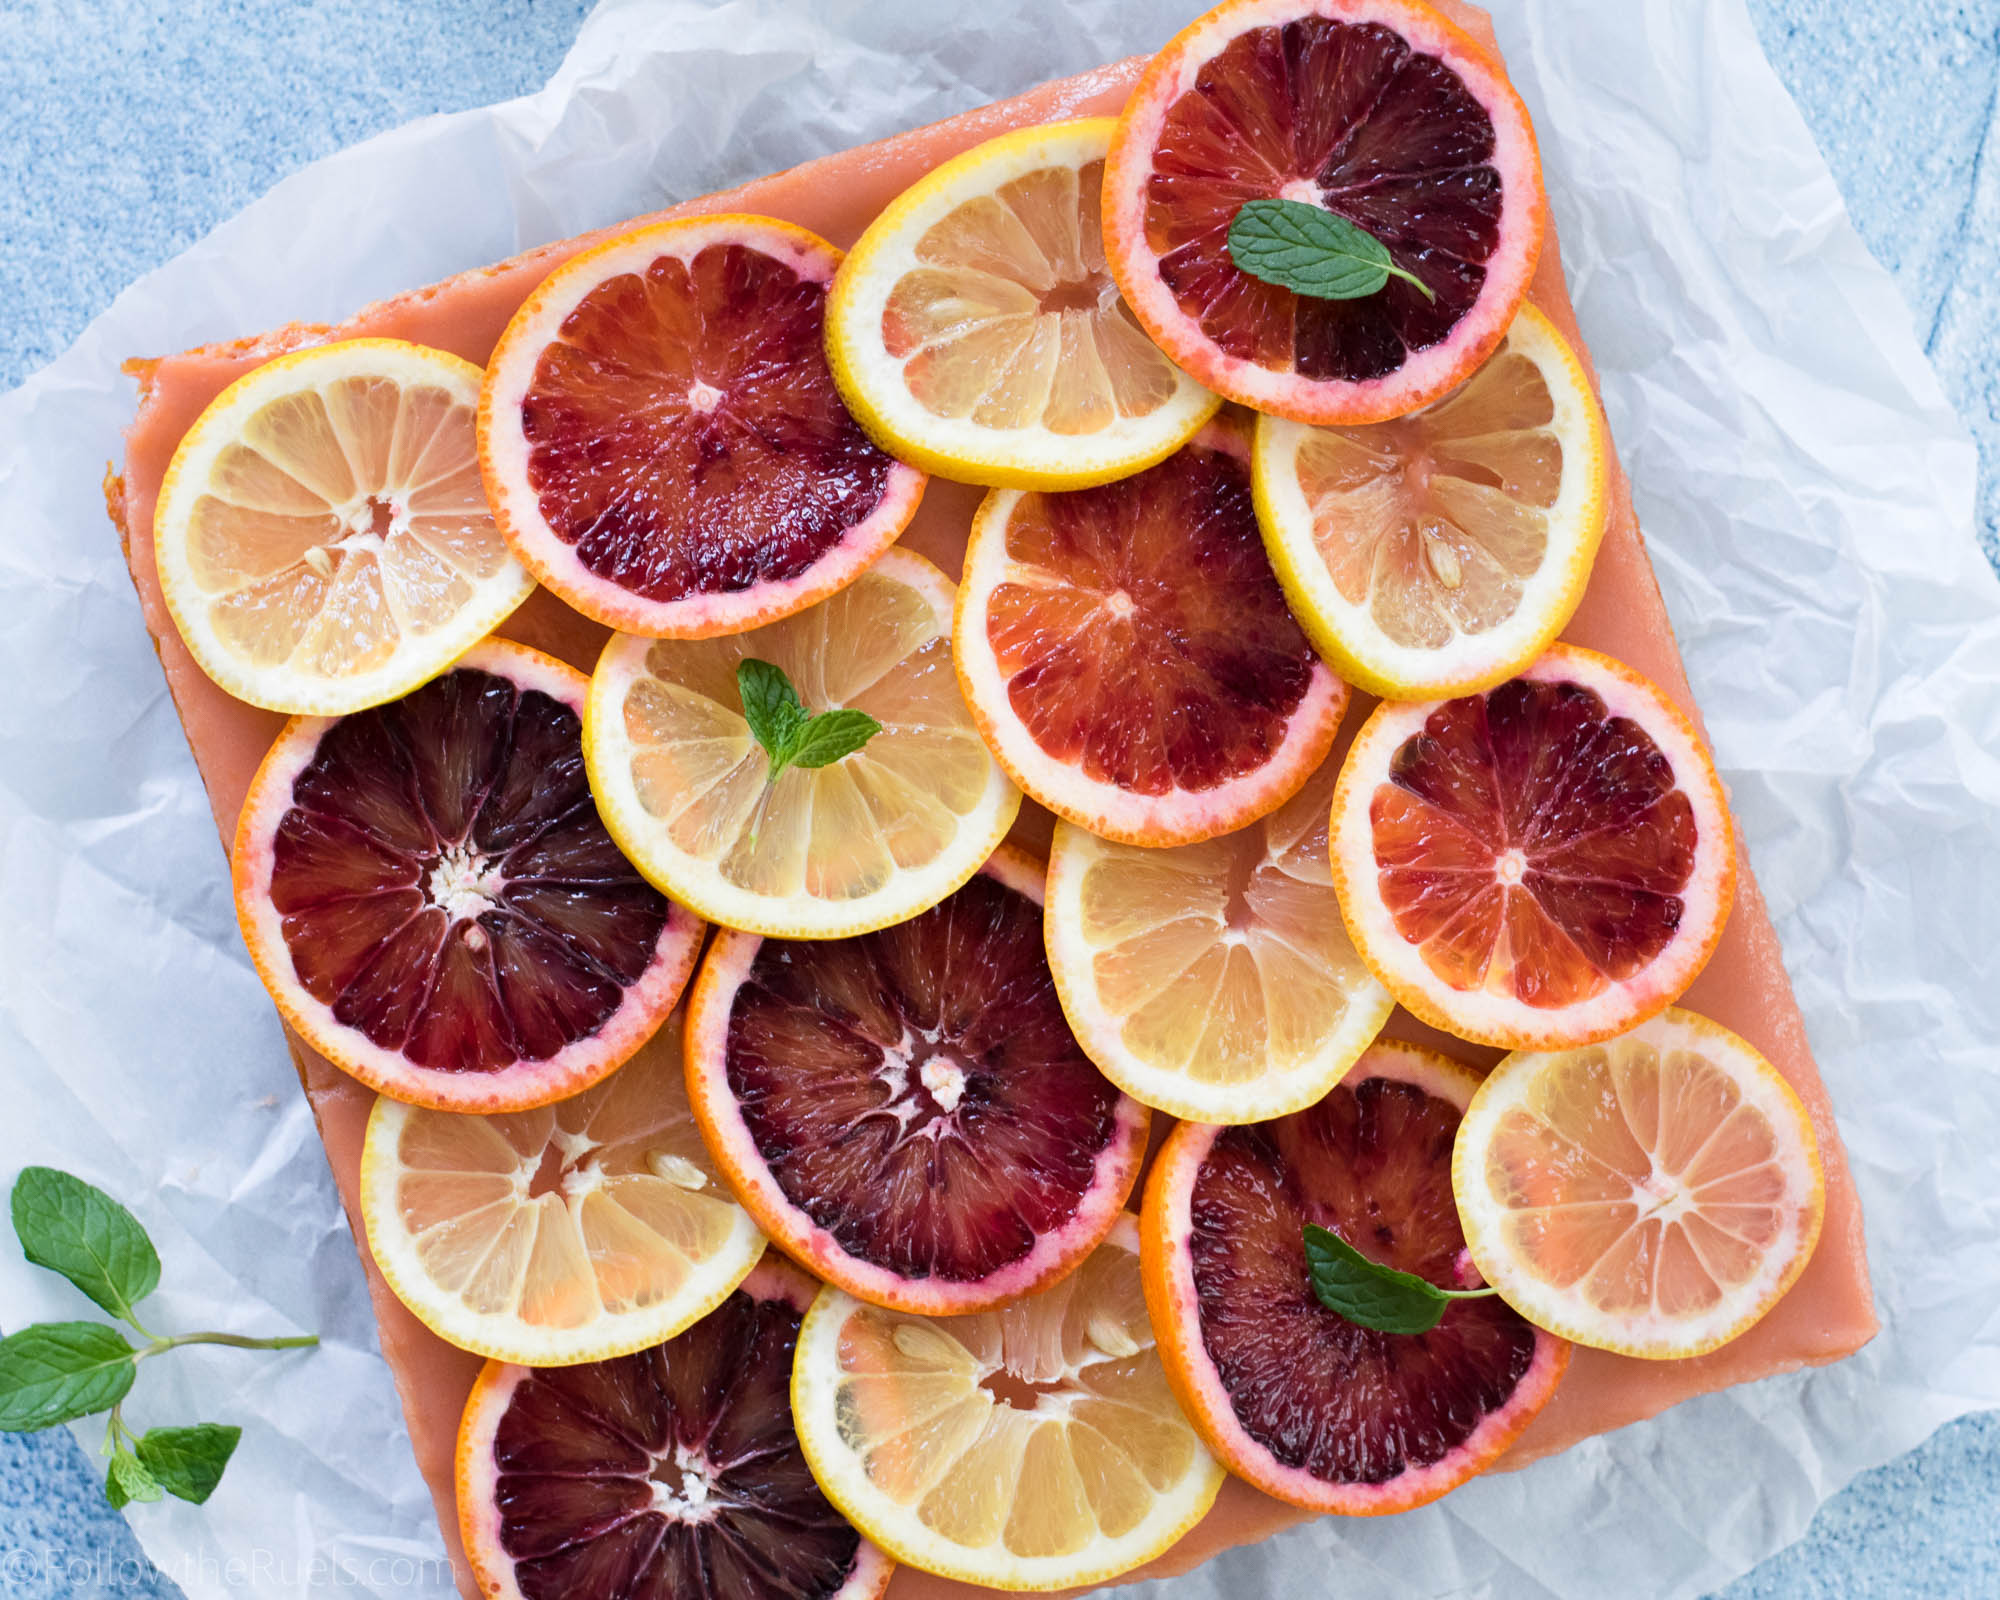 Blood-Orange-Lemon-Bars-13.jpg